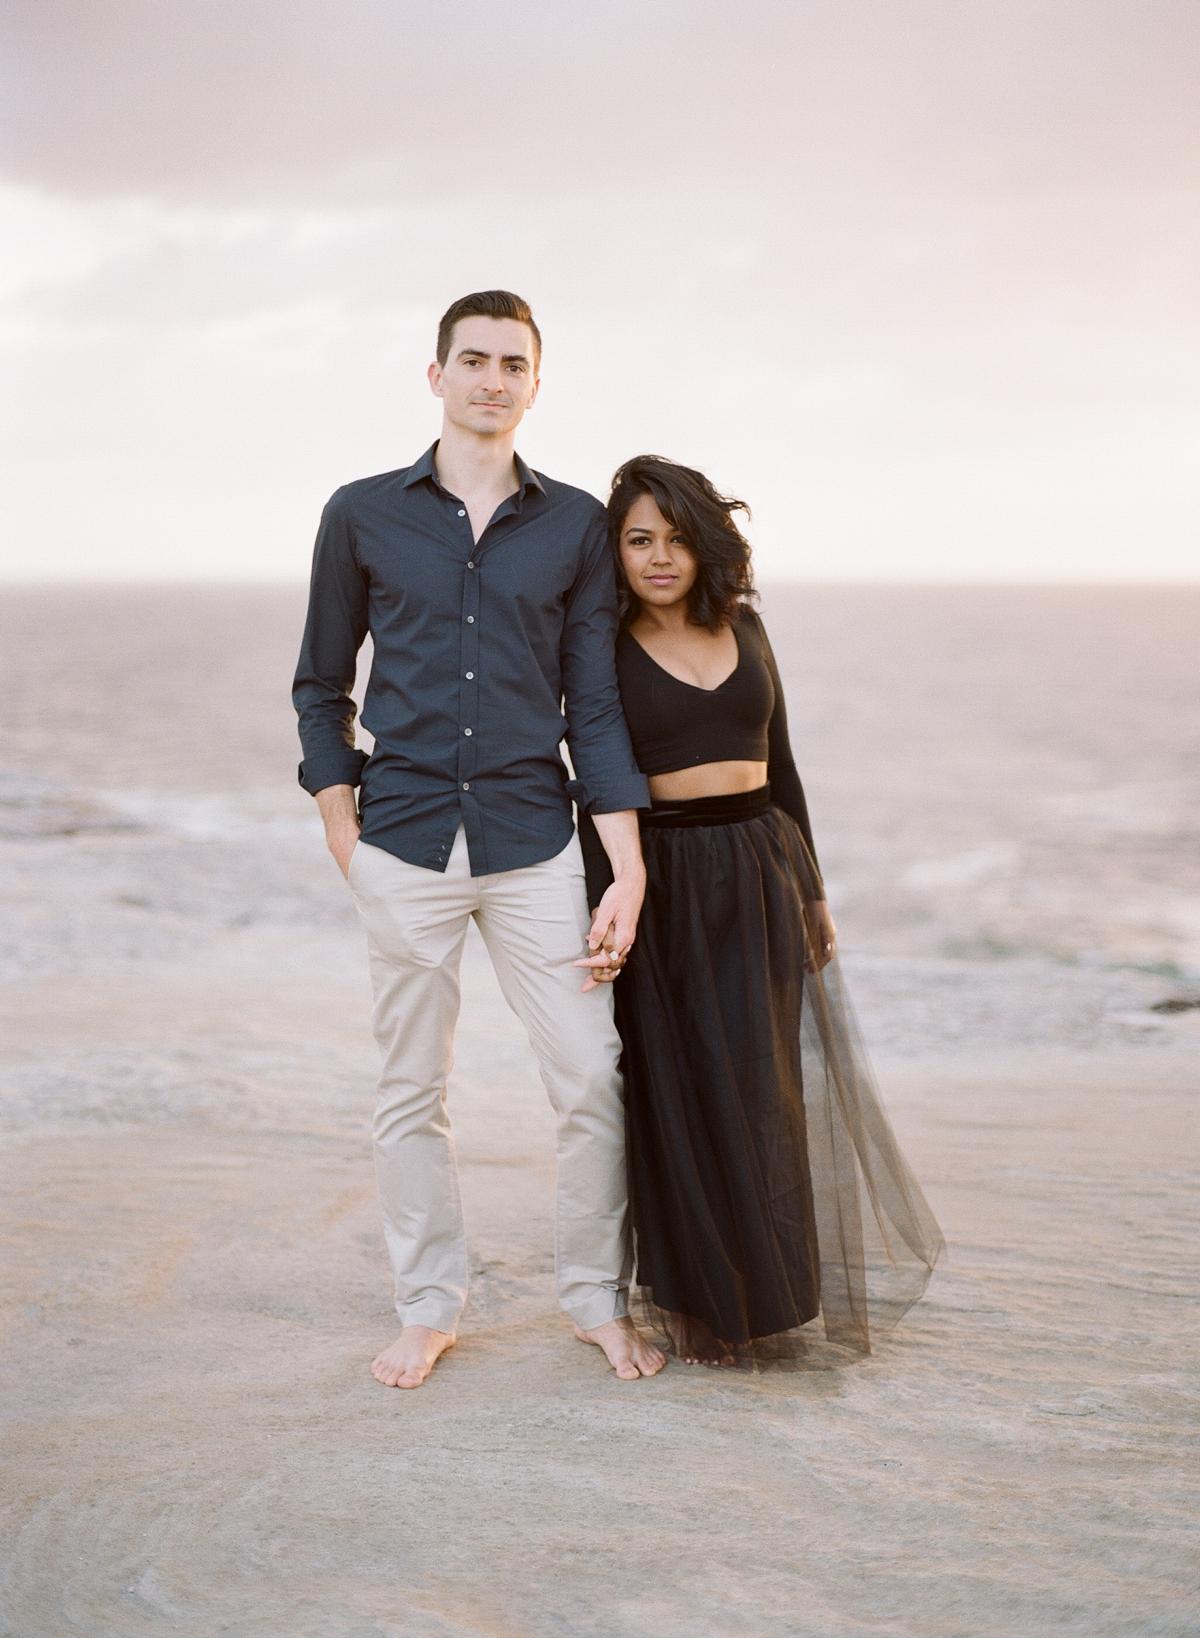 Coastal Sydney couples session by Mr Edwards Photography_0737_1165.jpg